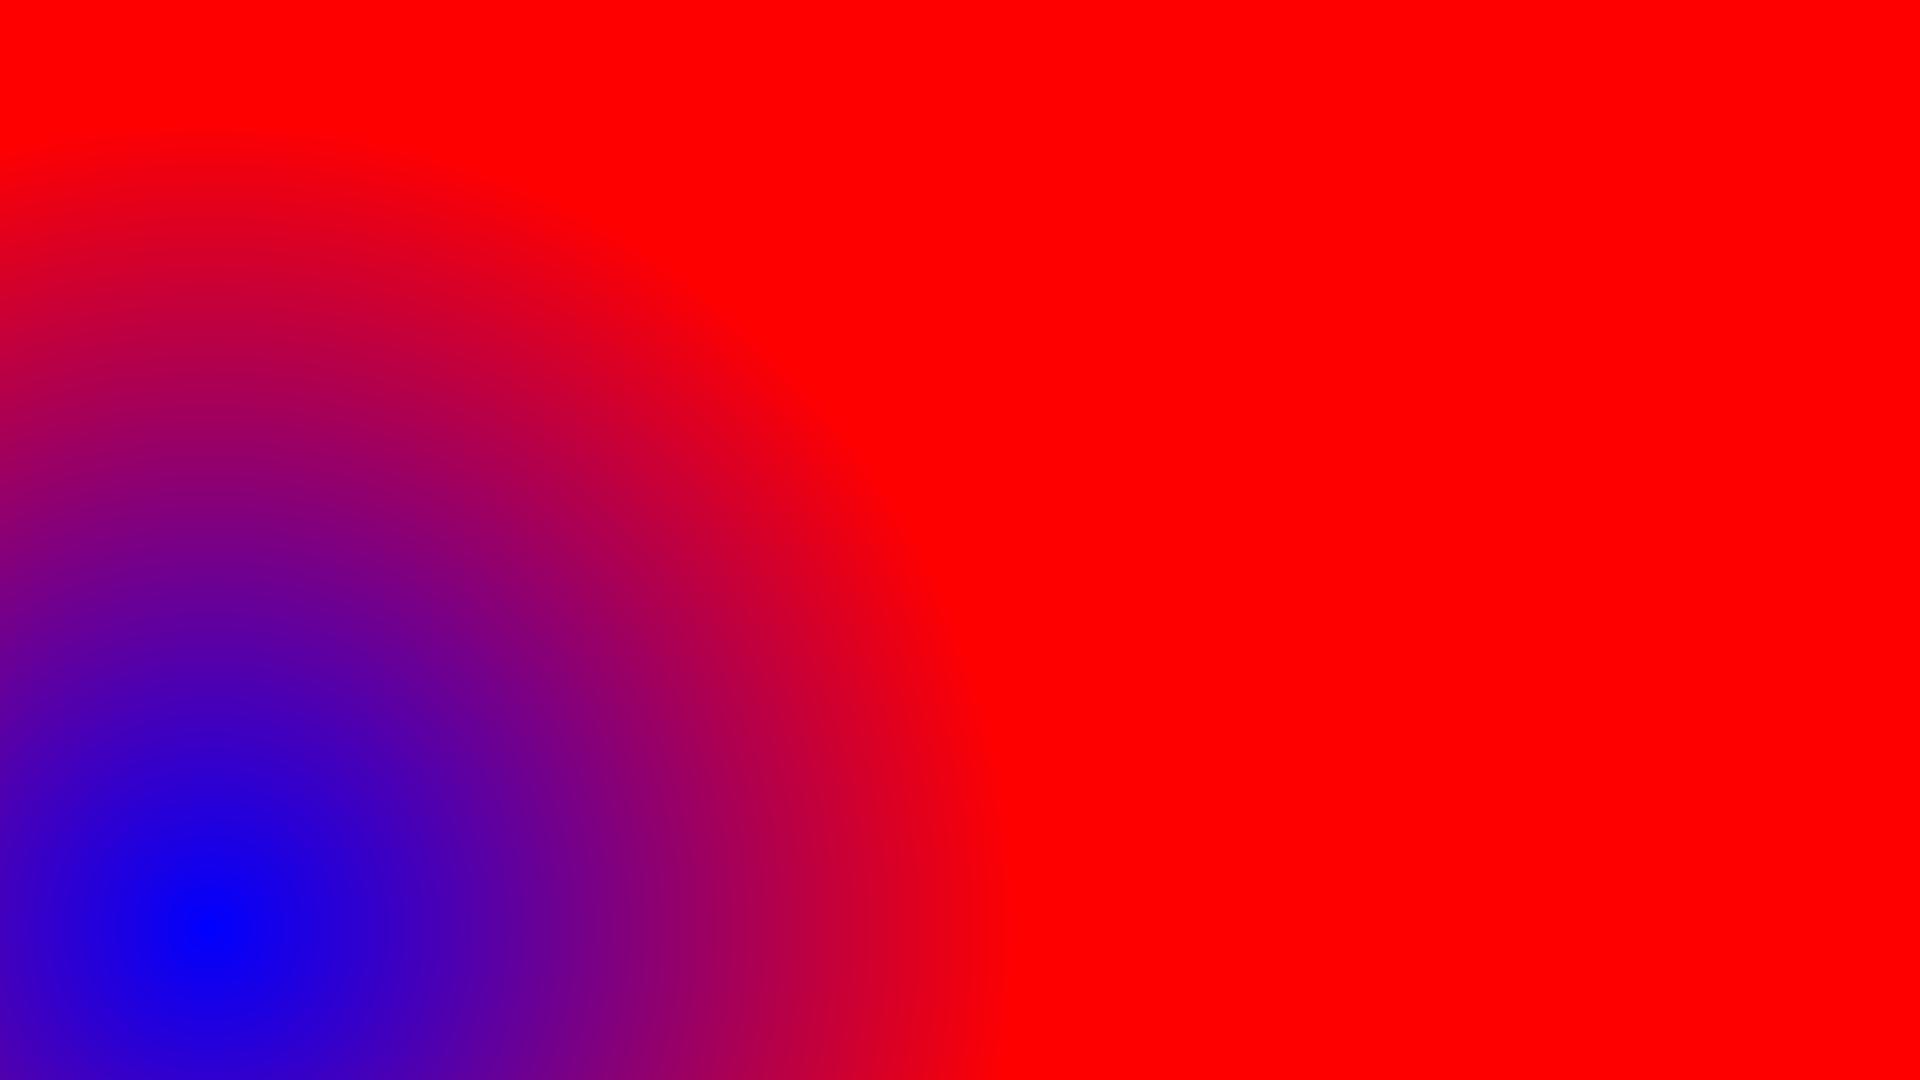 Blue-red gradient Gradient